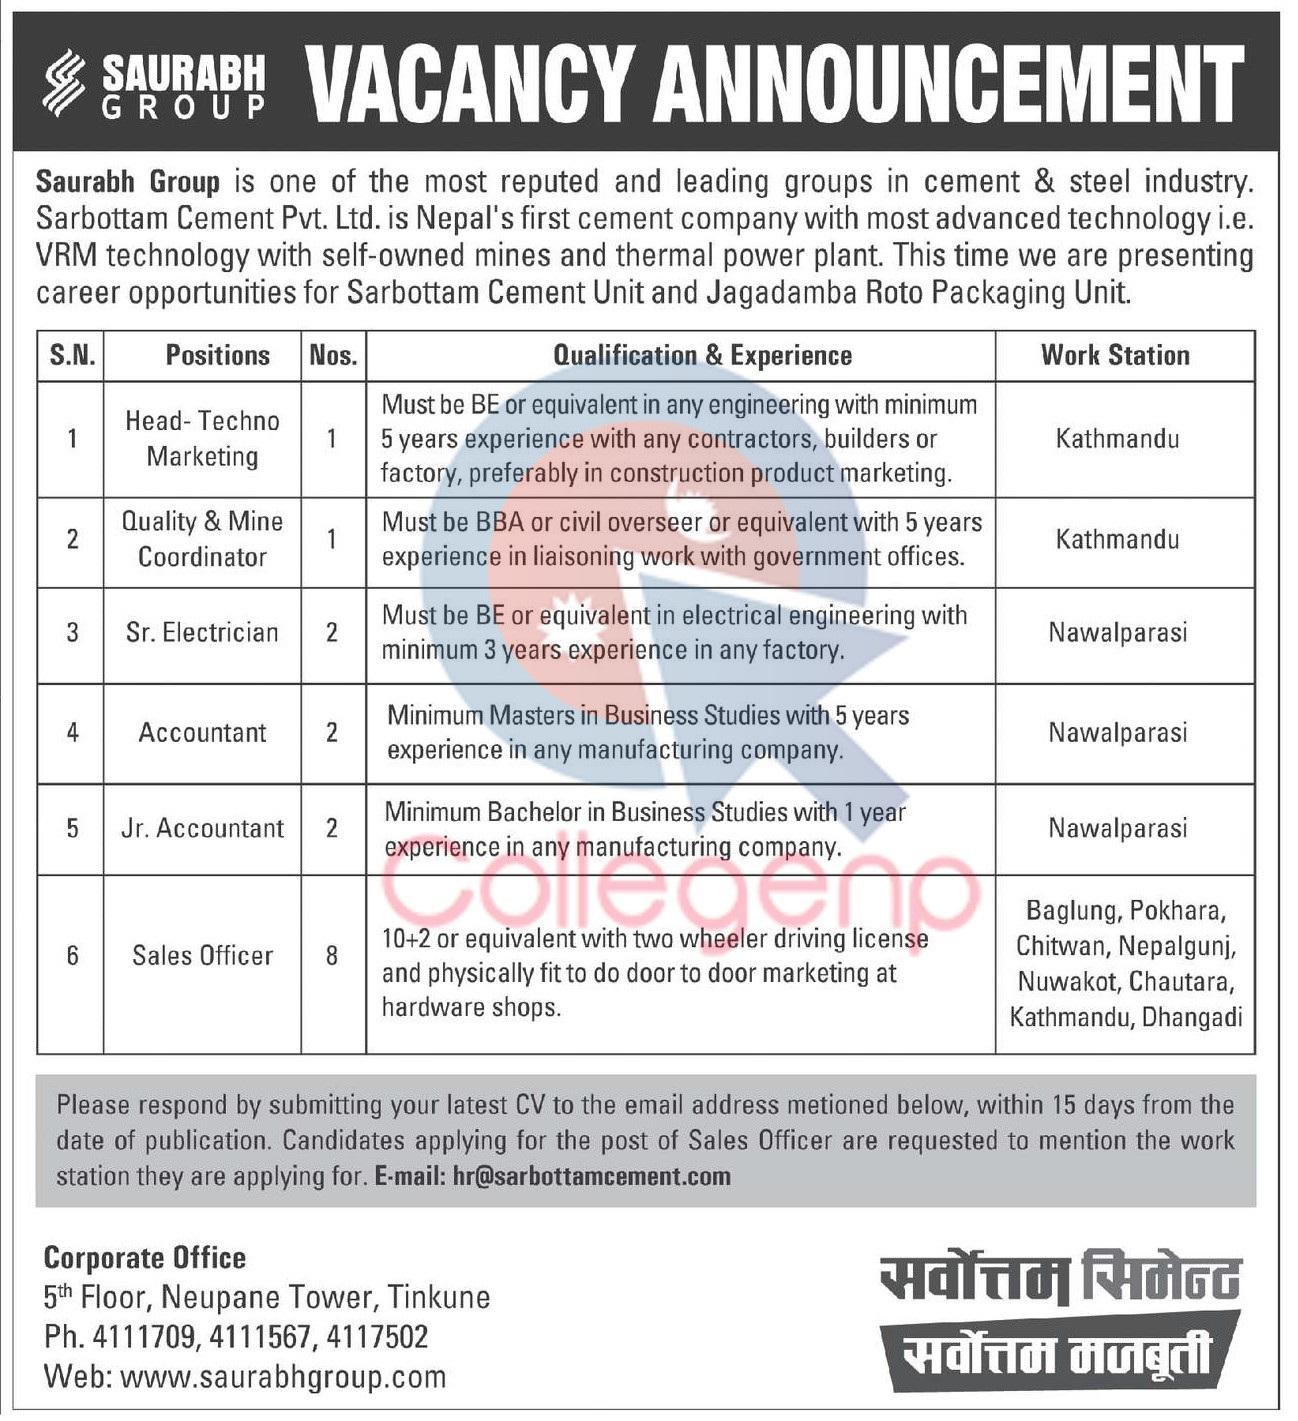 Sarbottam Cement Job Vacancy Announcement | Collegenp